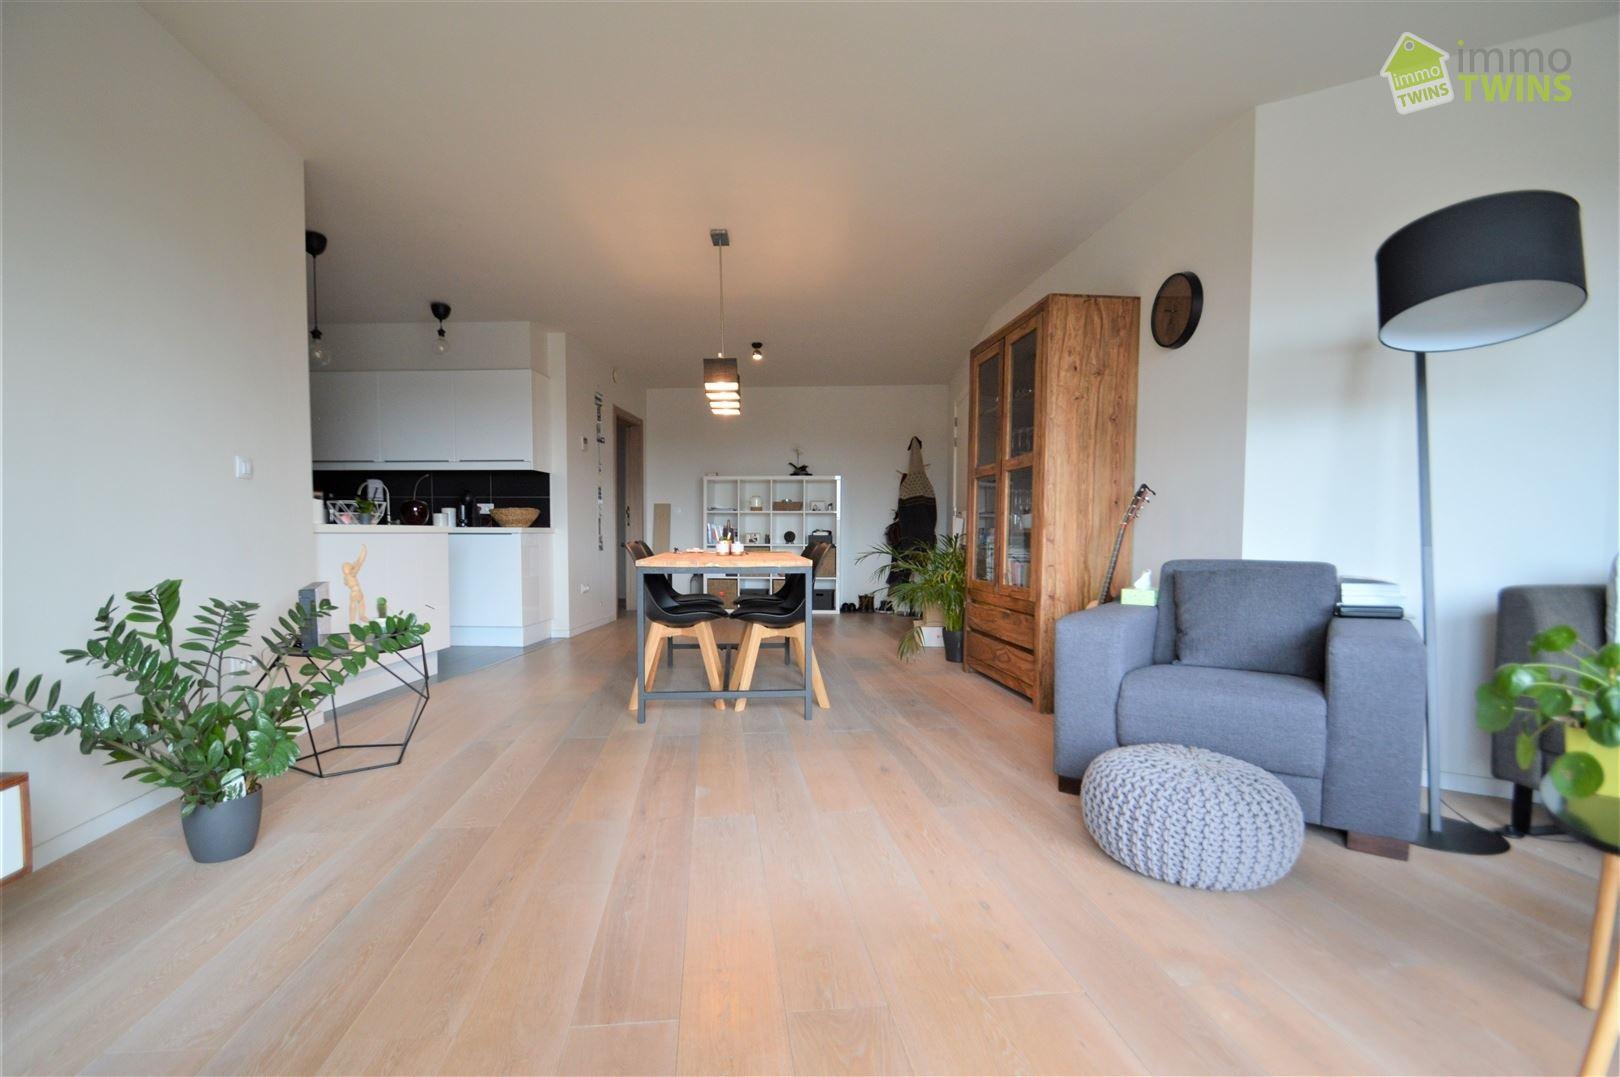 Foto 2 : Appartement te 9200 SINT-GILLIS-DENDERMONDE (België) - Prijs € 835